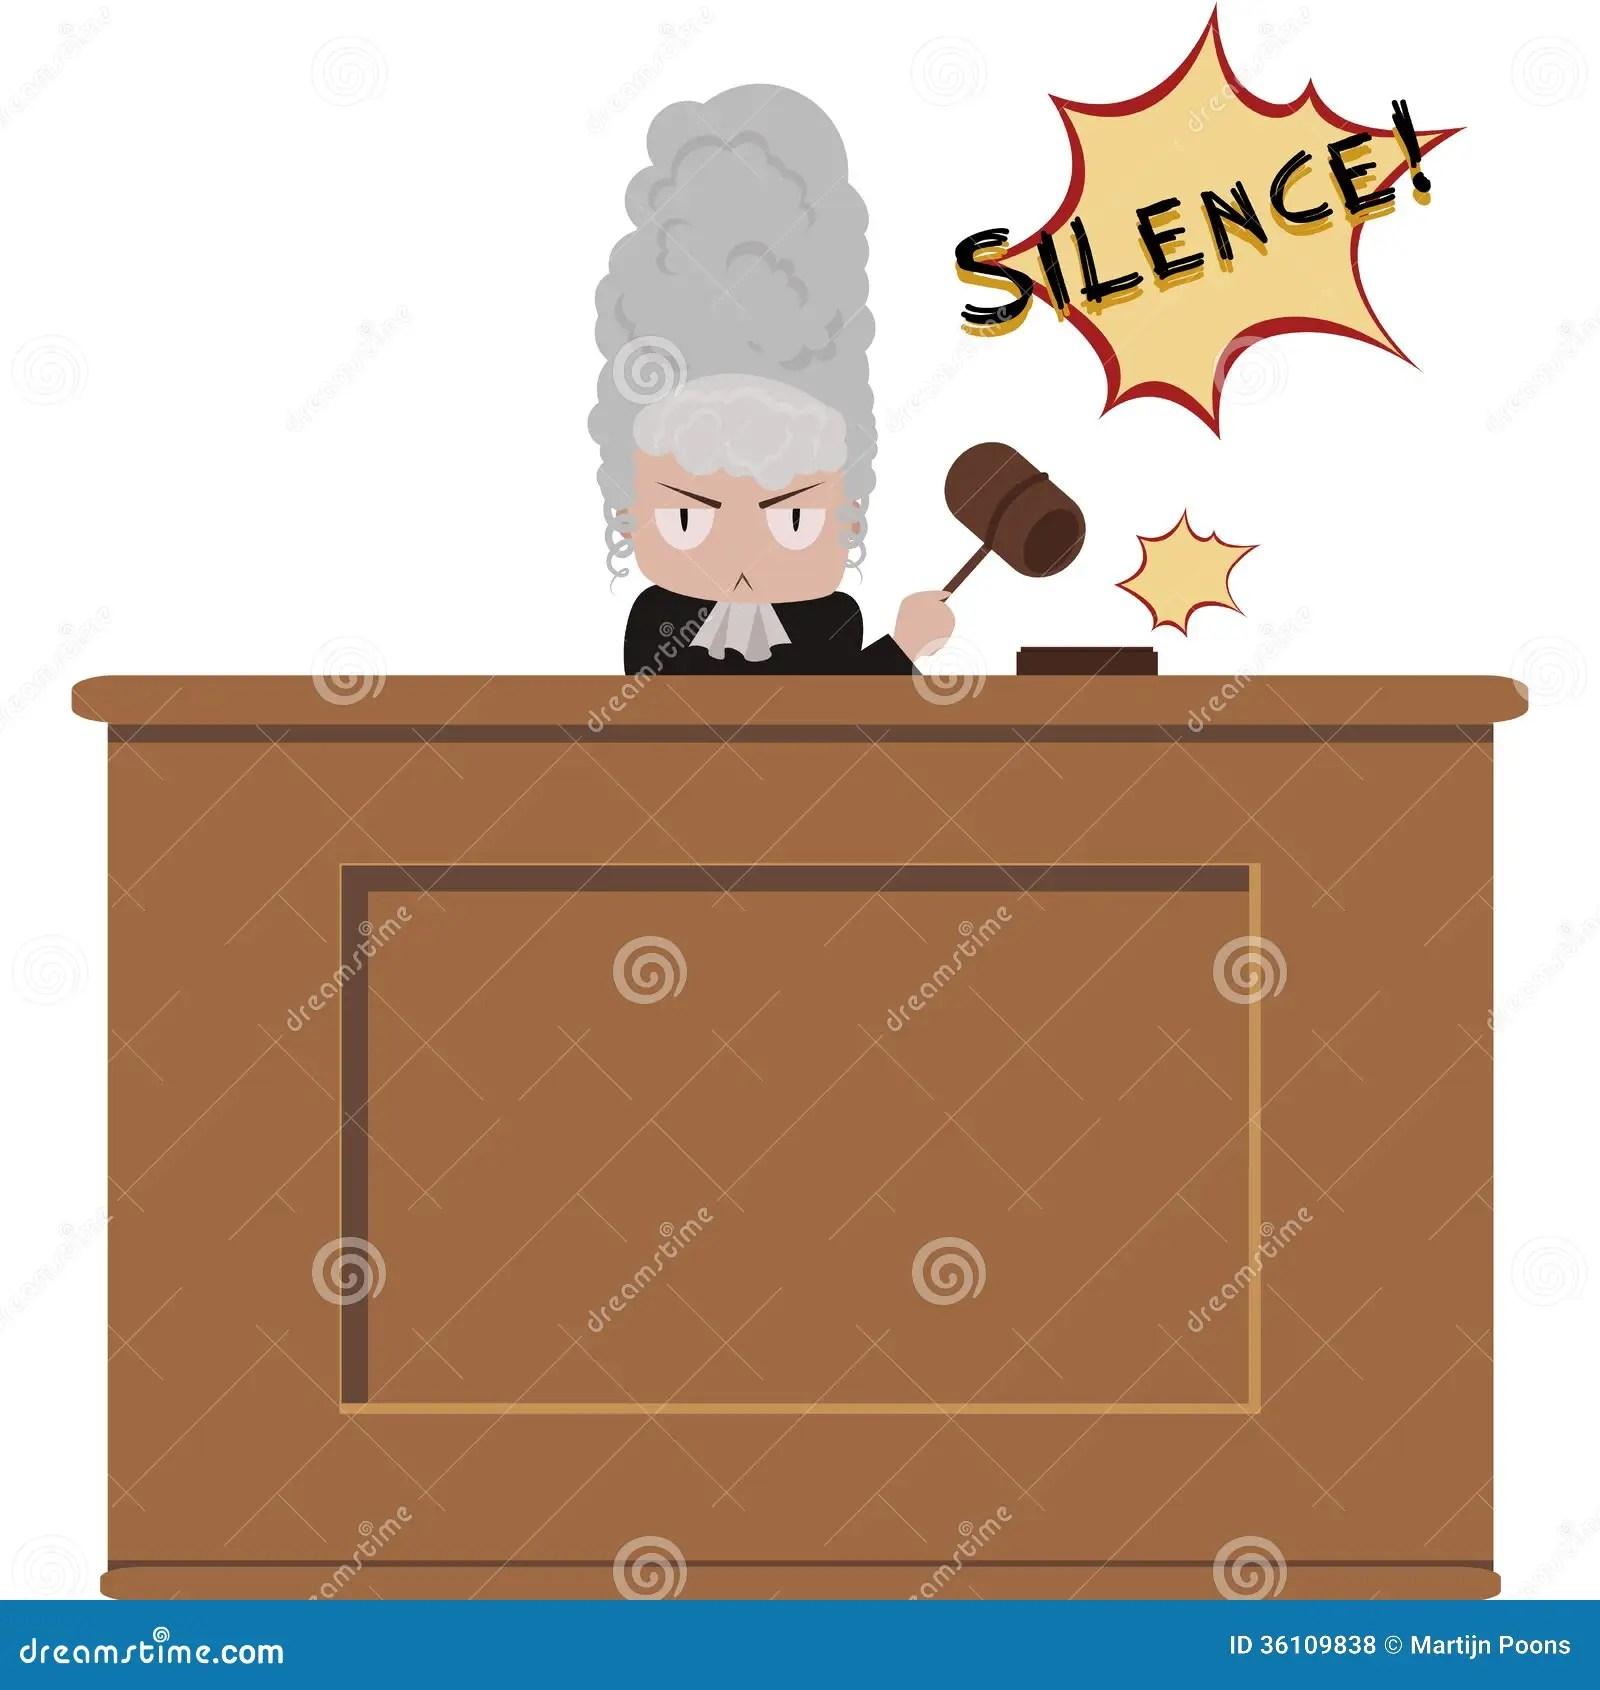 9 Supreme Court Judge Cartoon